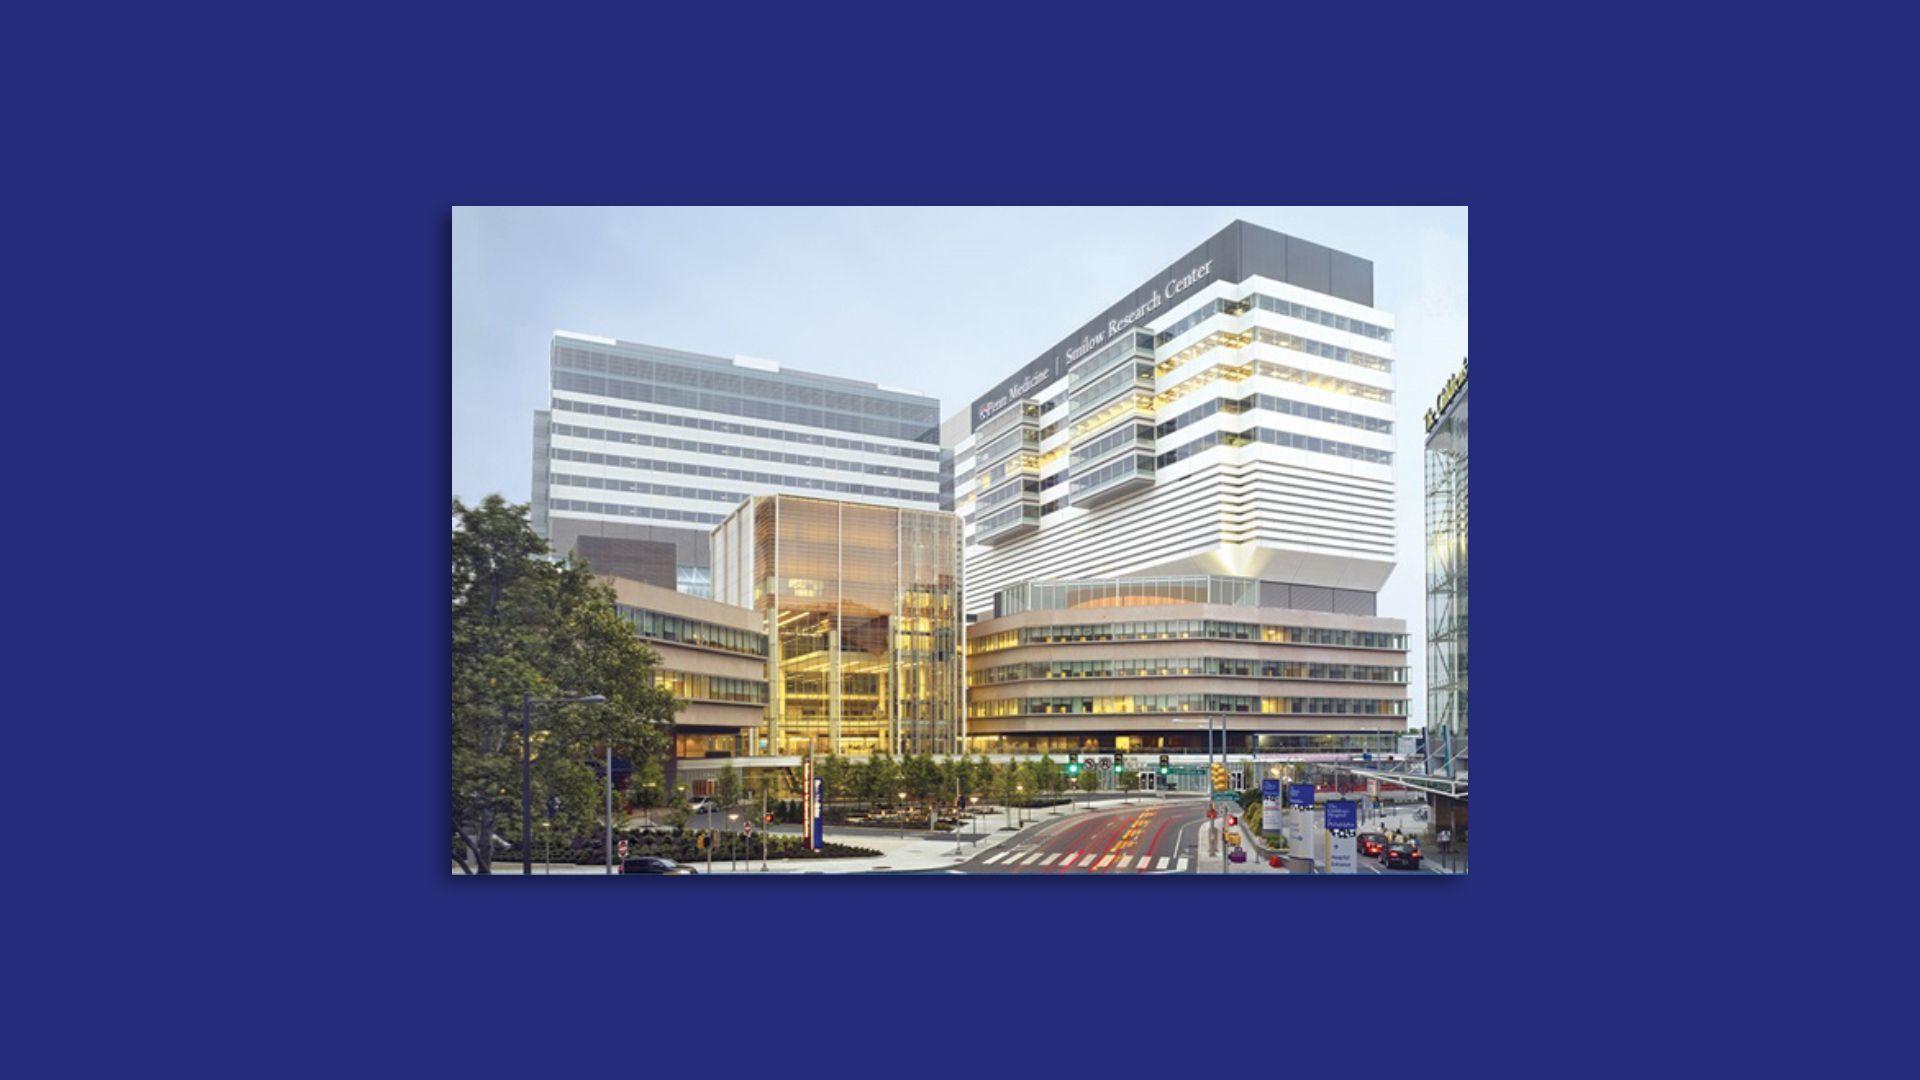 Perelman School of Medicine at the University of Pennsylvania